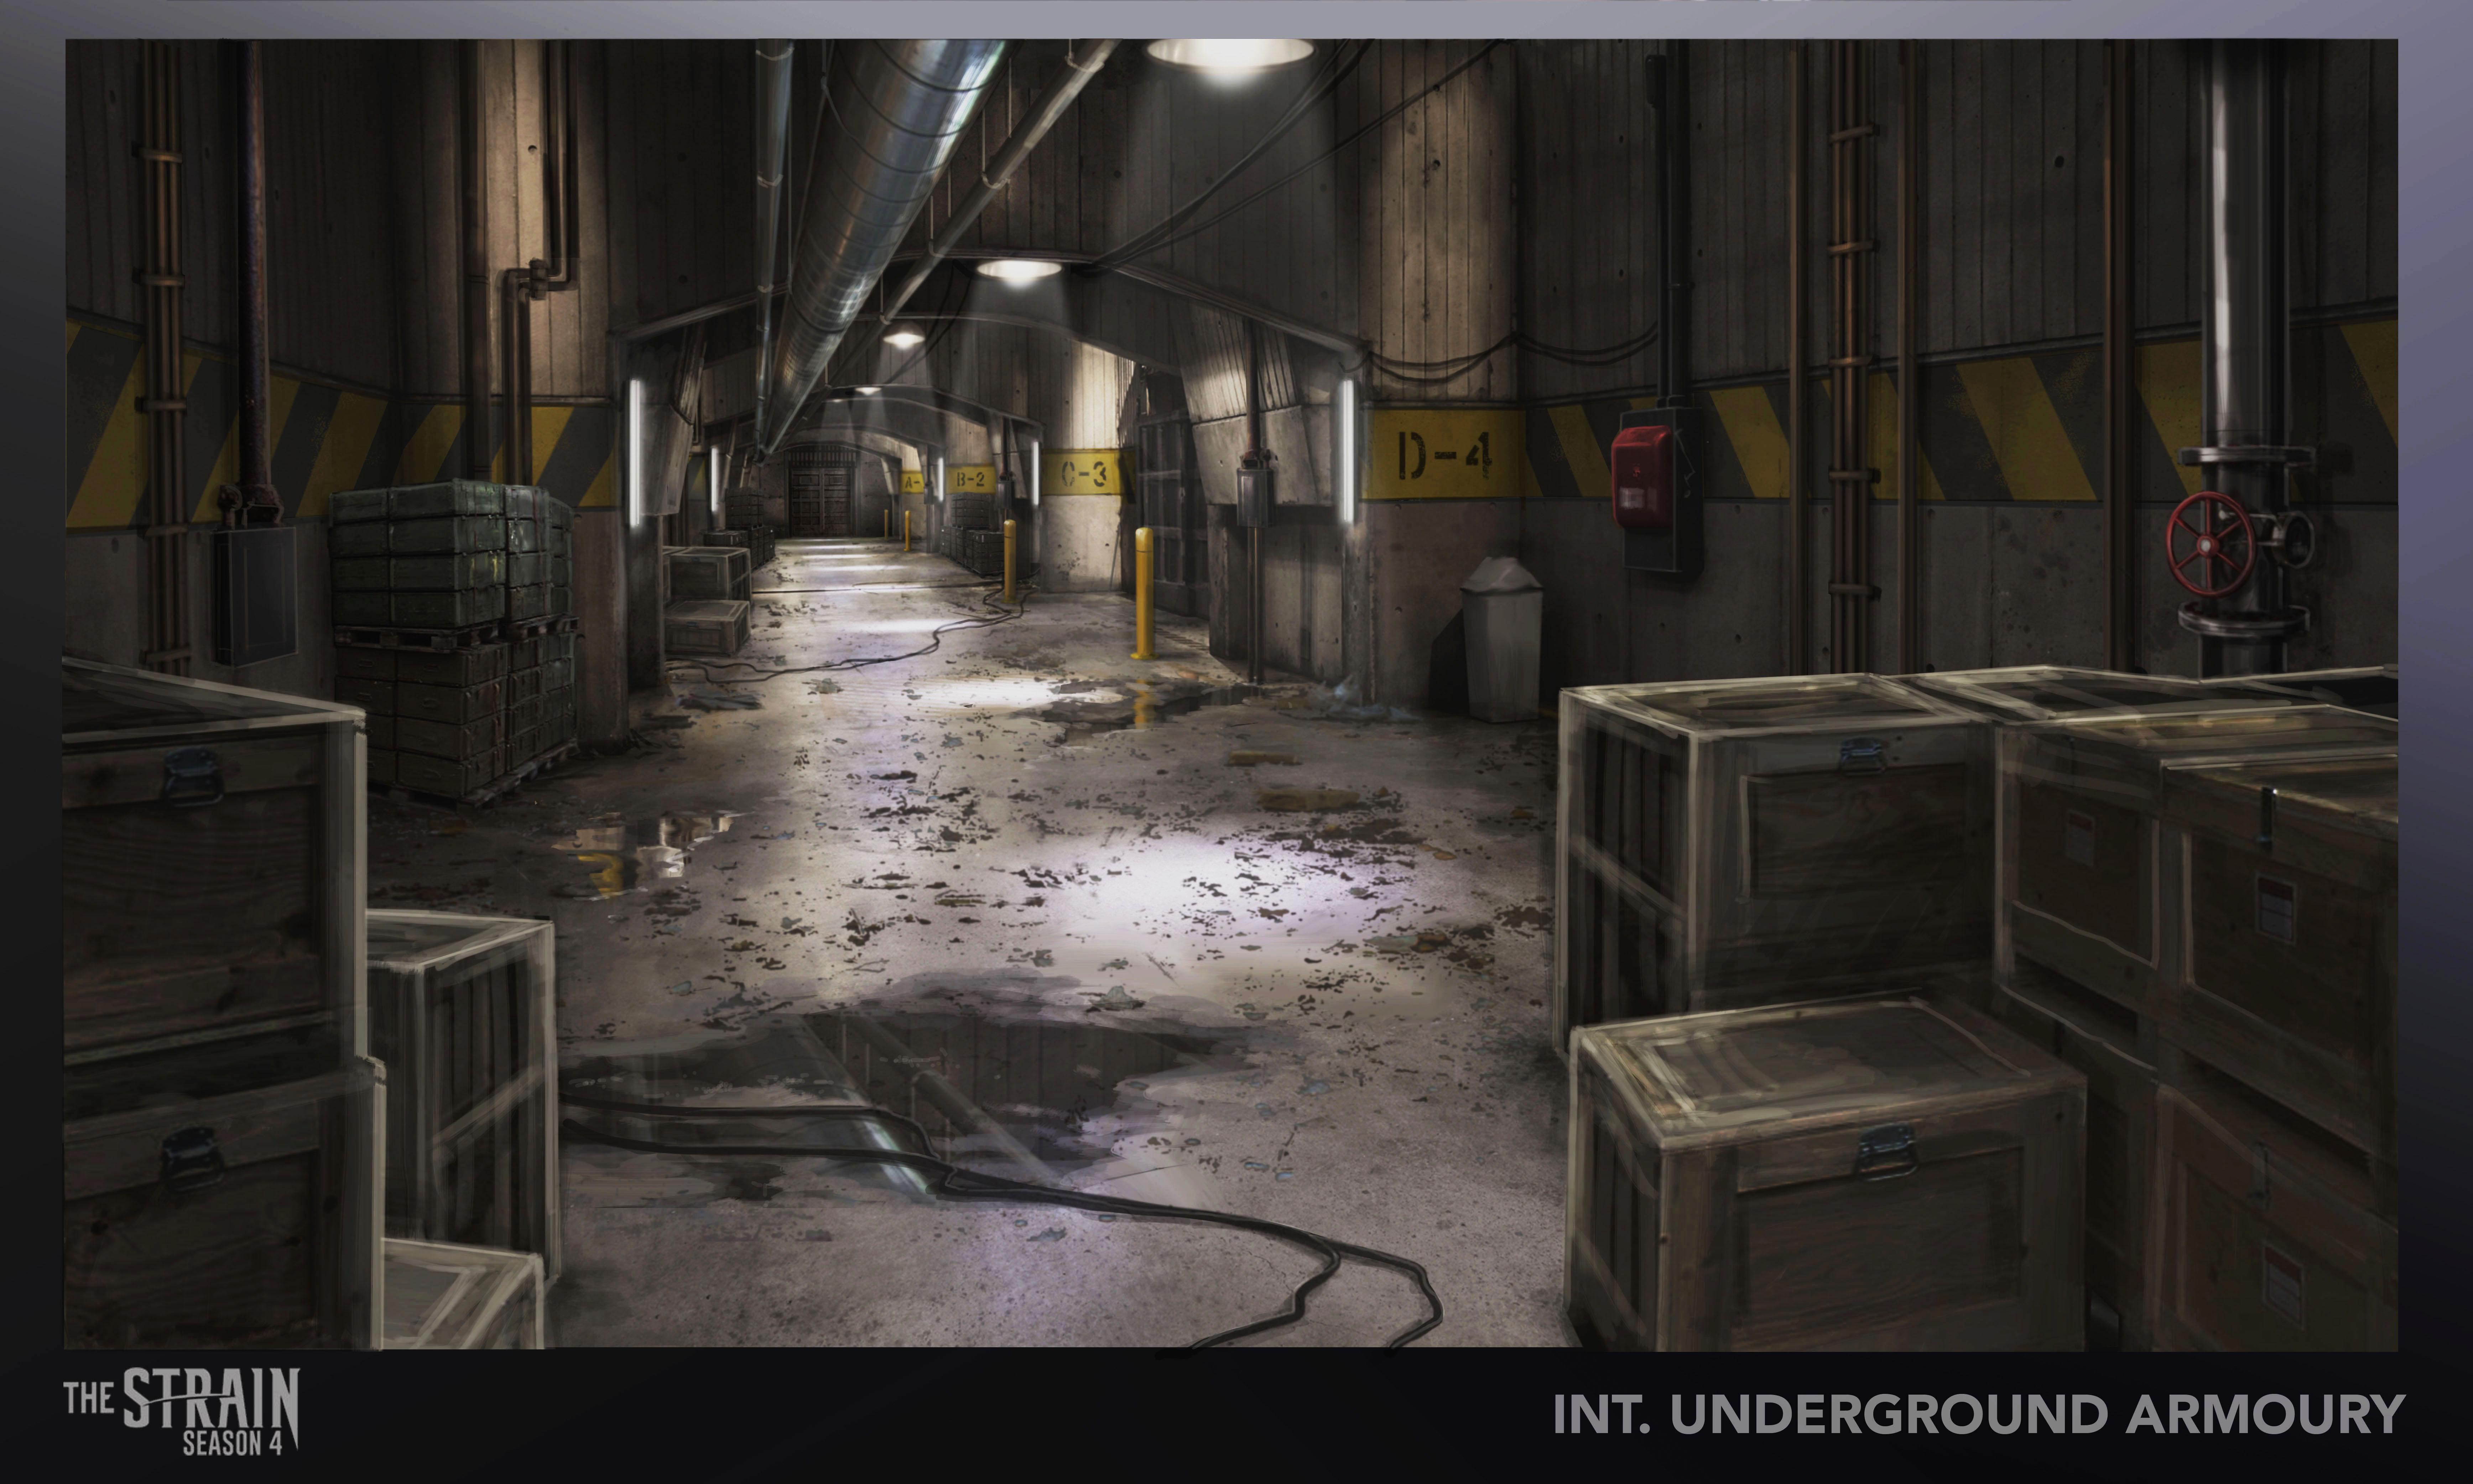 Int. Underground Armoury